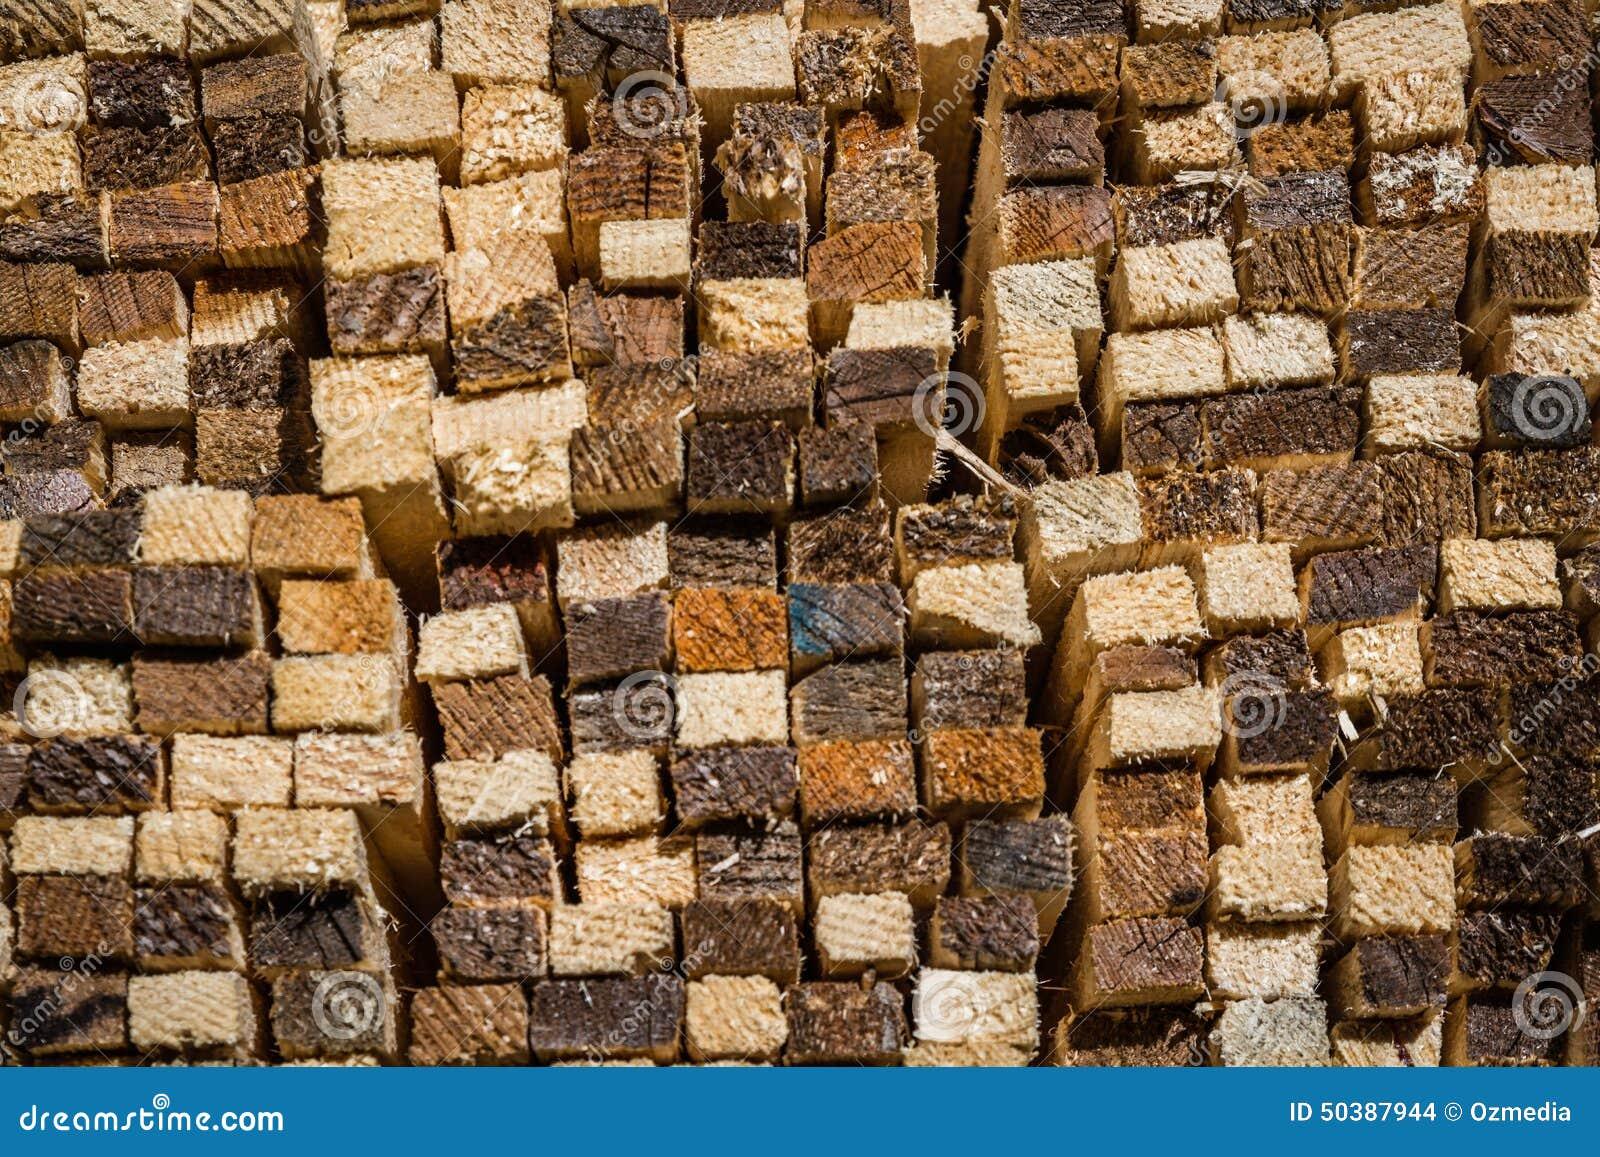 Madera de madera apilada del pino foto de archivo imagen - Maderas del pino ...